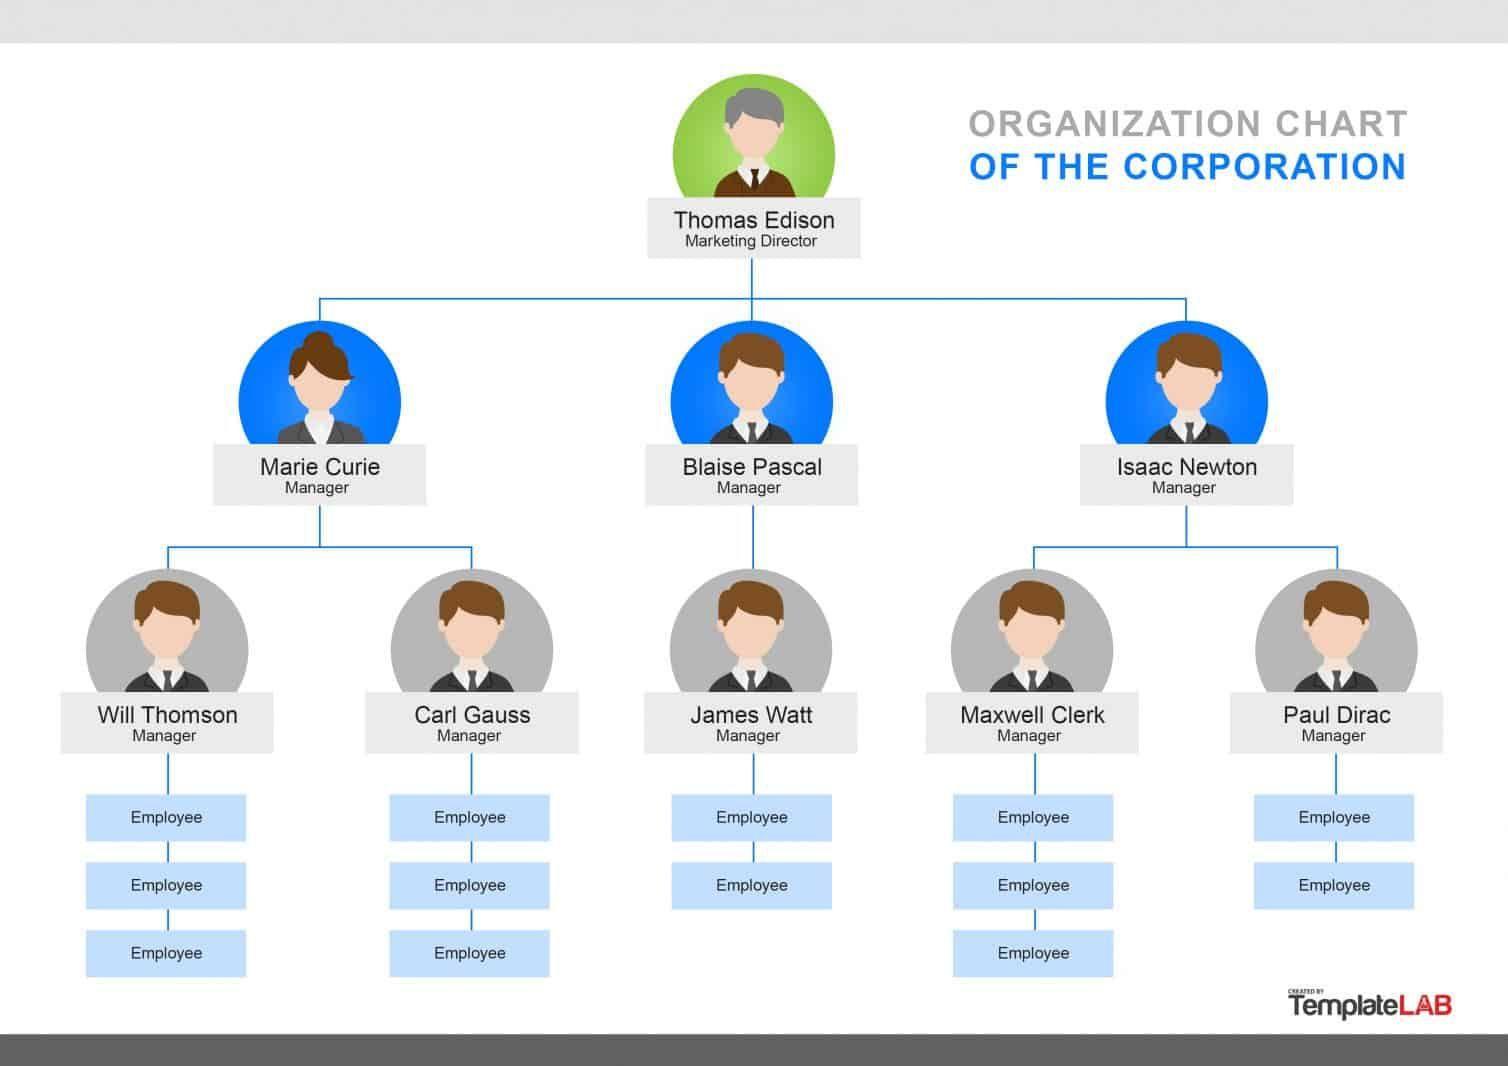 000 Singular Organizational Chart Template Word Concept  2013 2010 2007Full